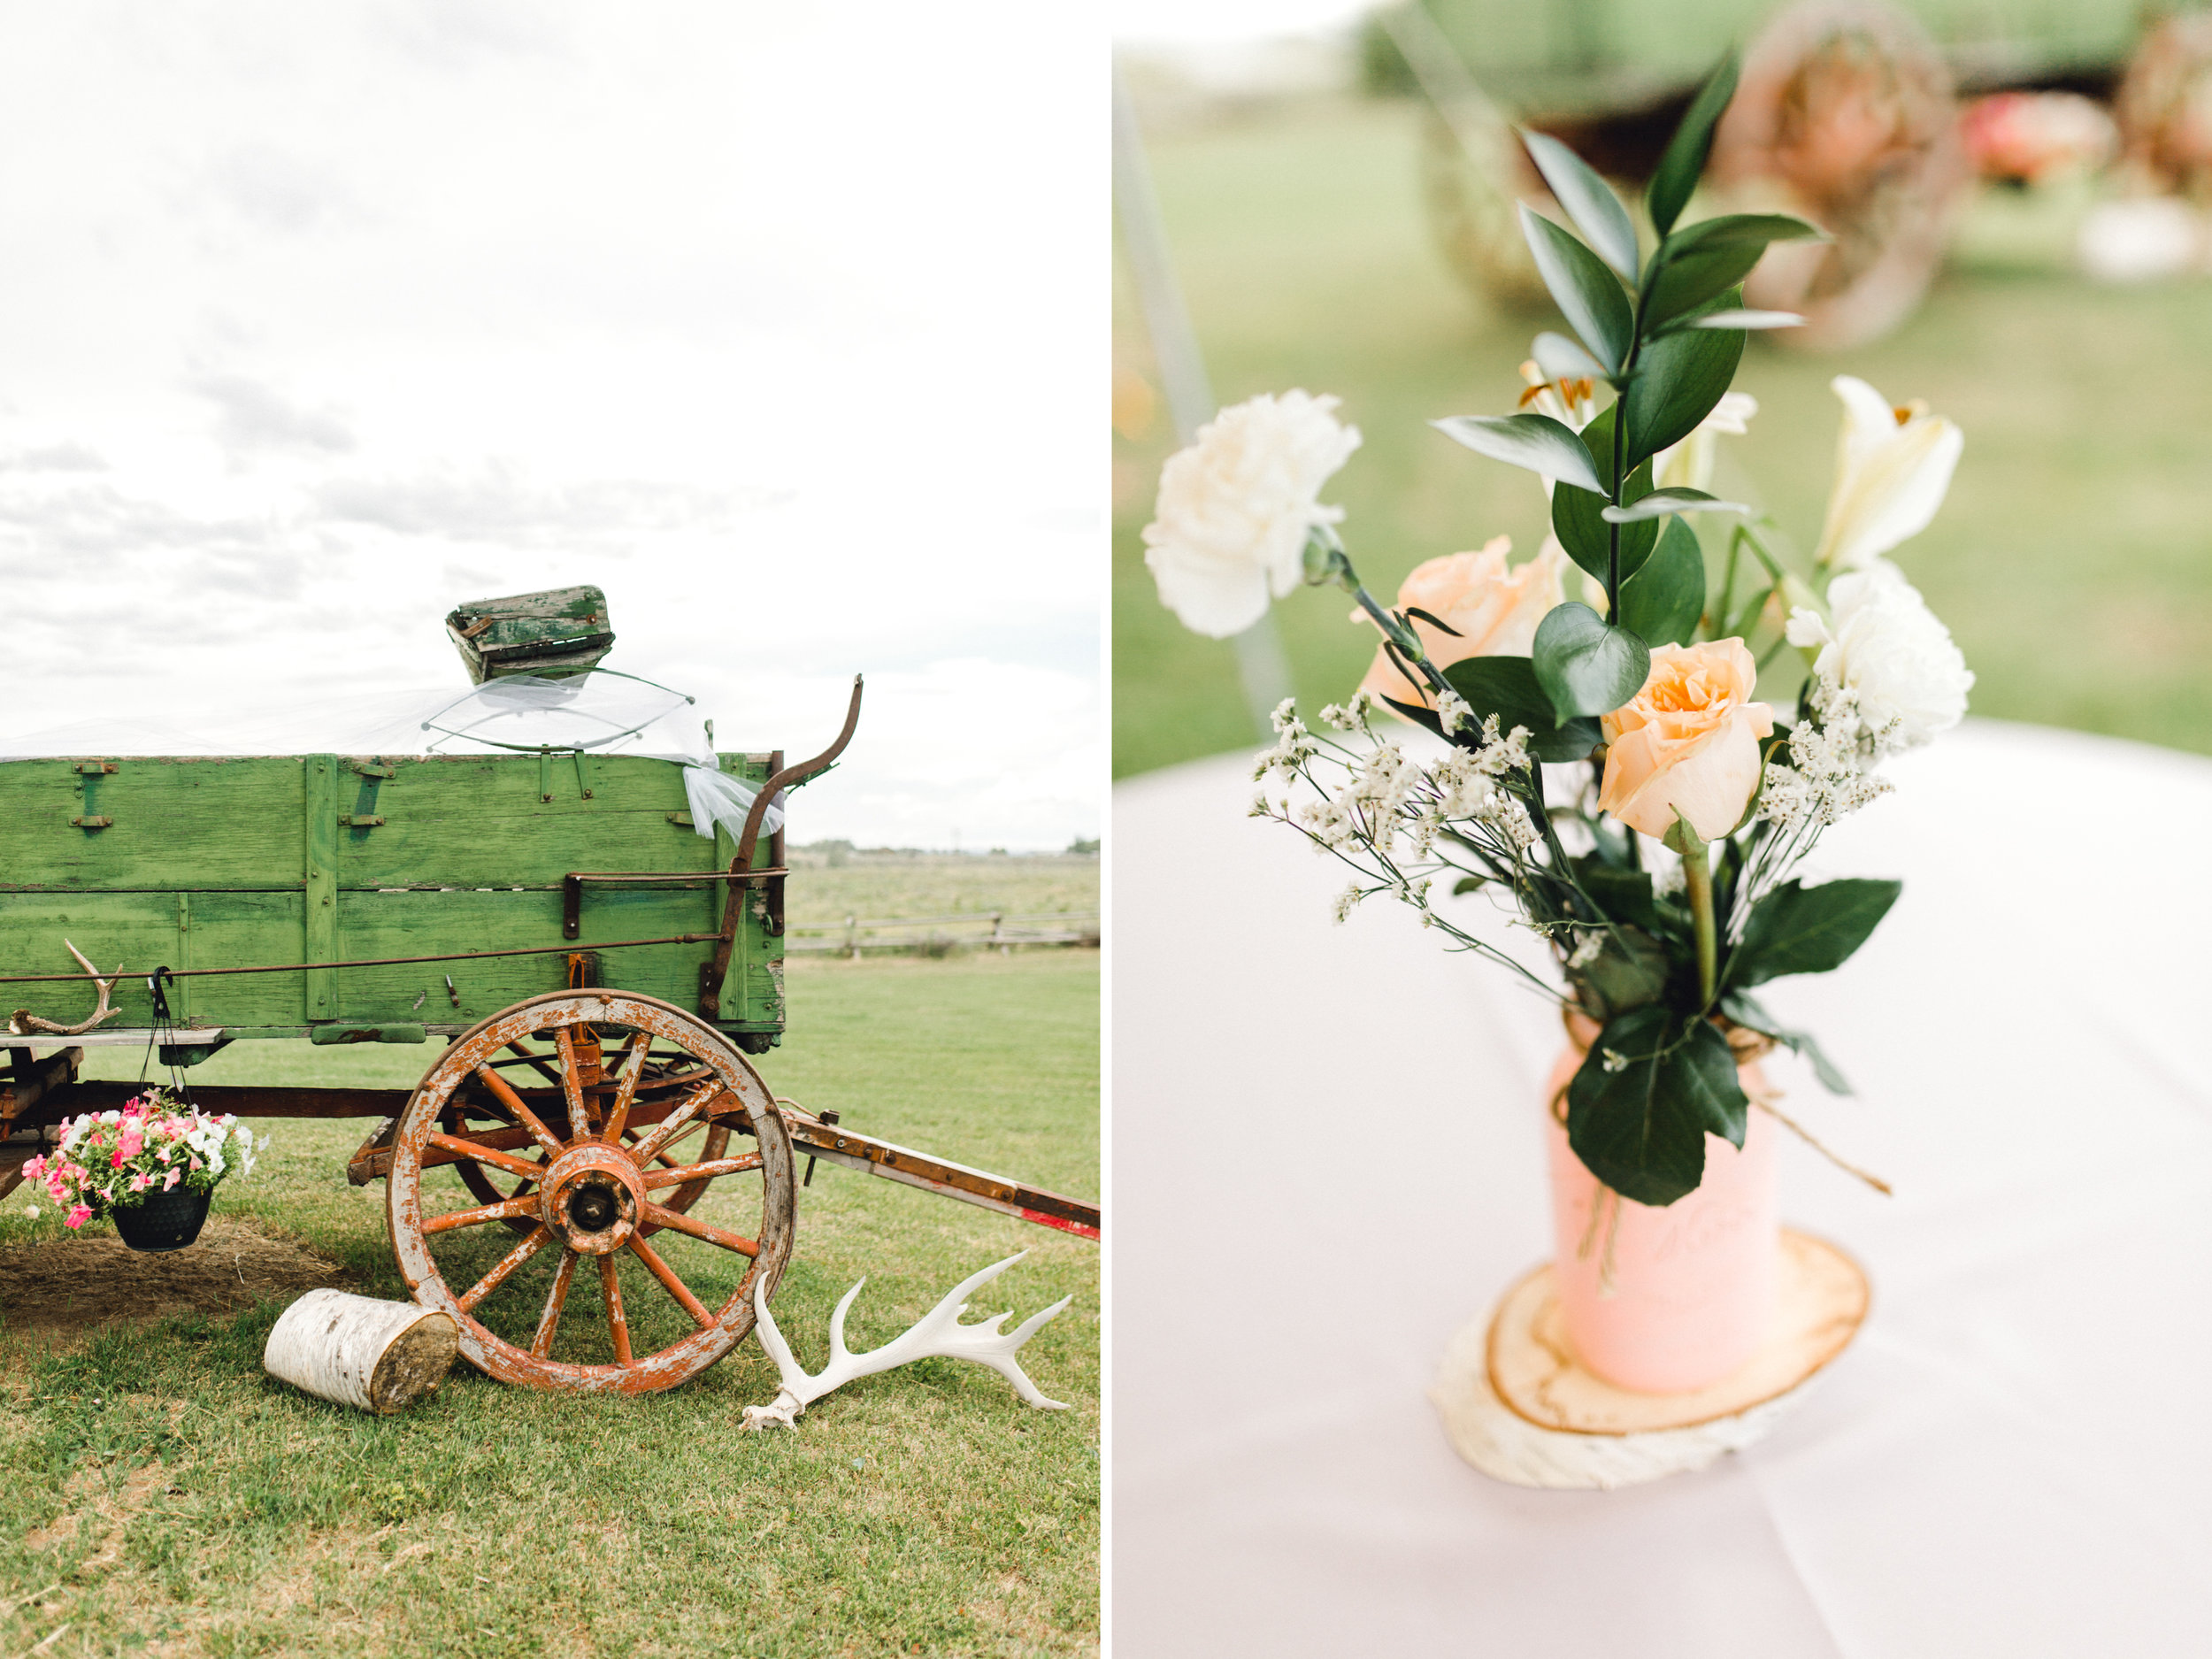 country-outdoor-rustic-wedding-tetons-idaho-anna-christine-photo-9.jpg